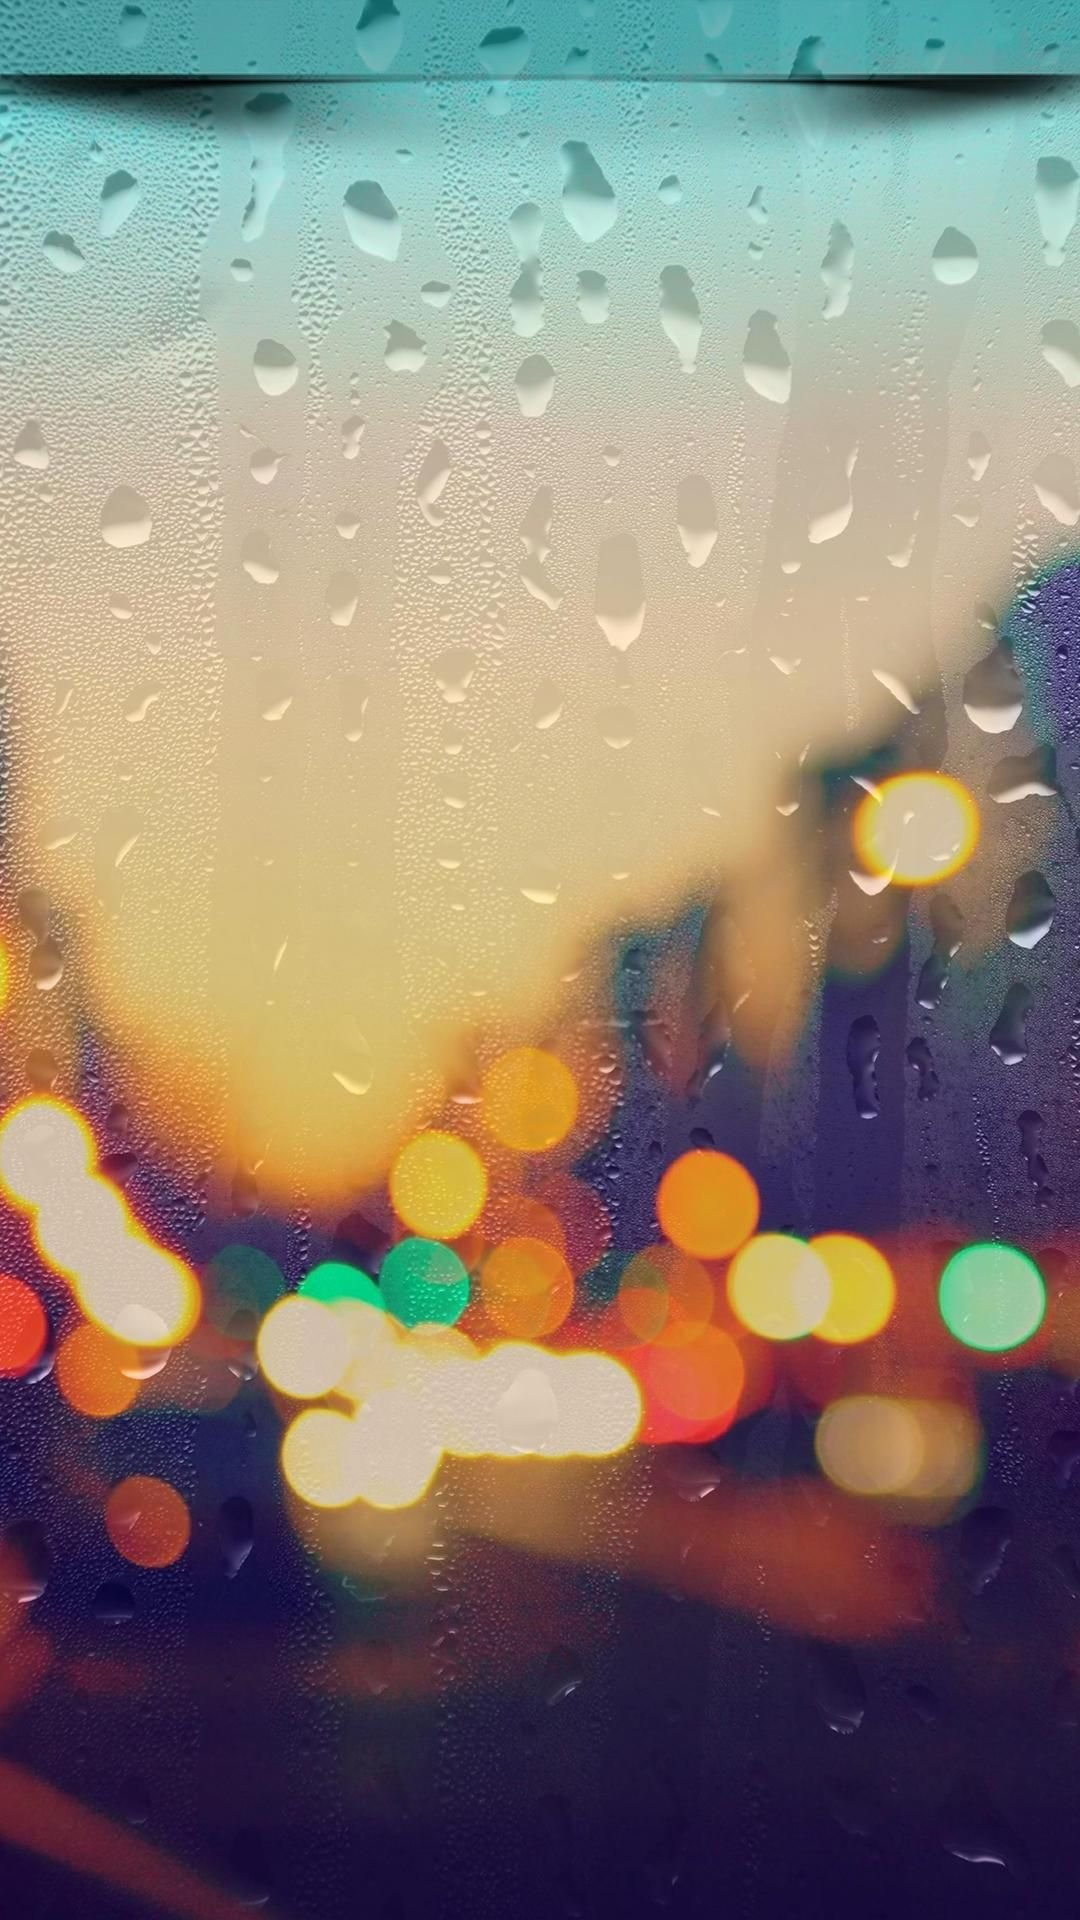 Rain Galaxy s9 wallpaper